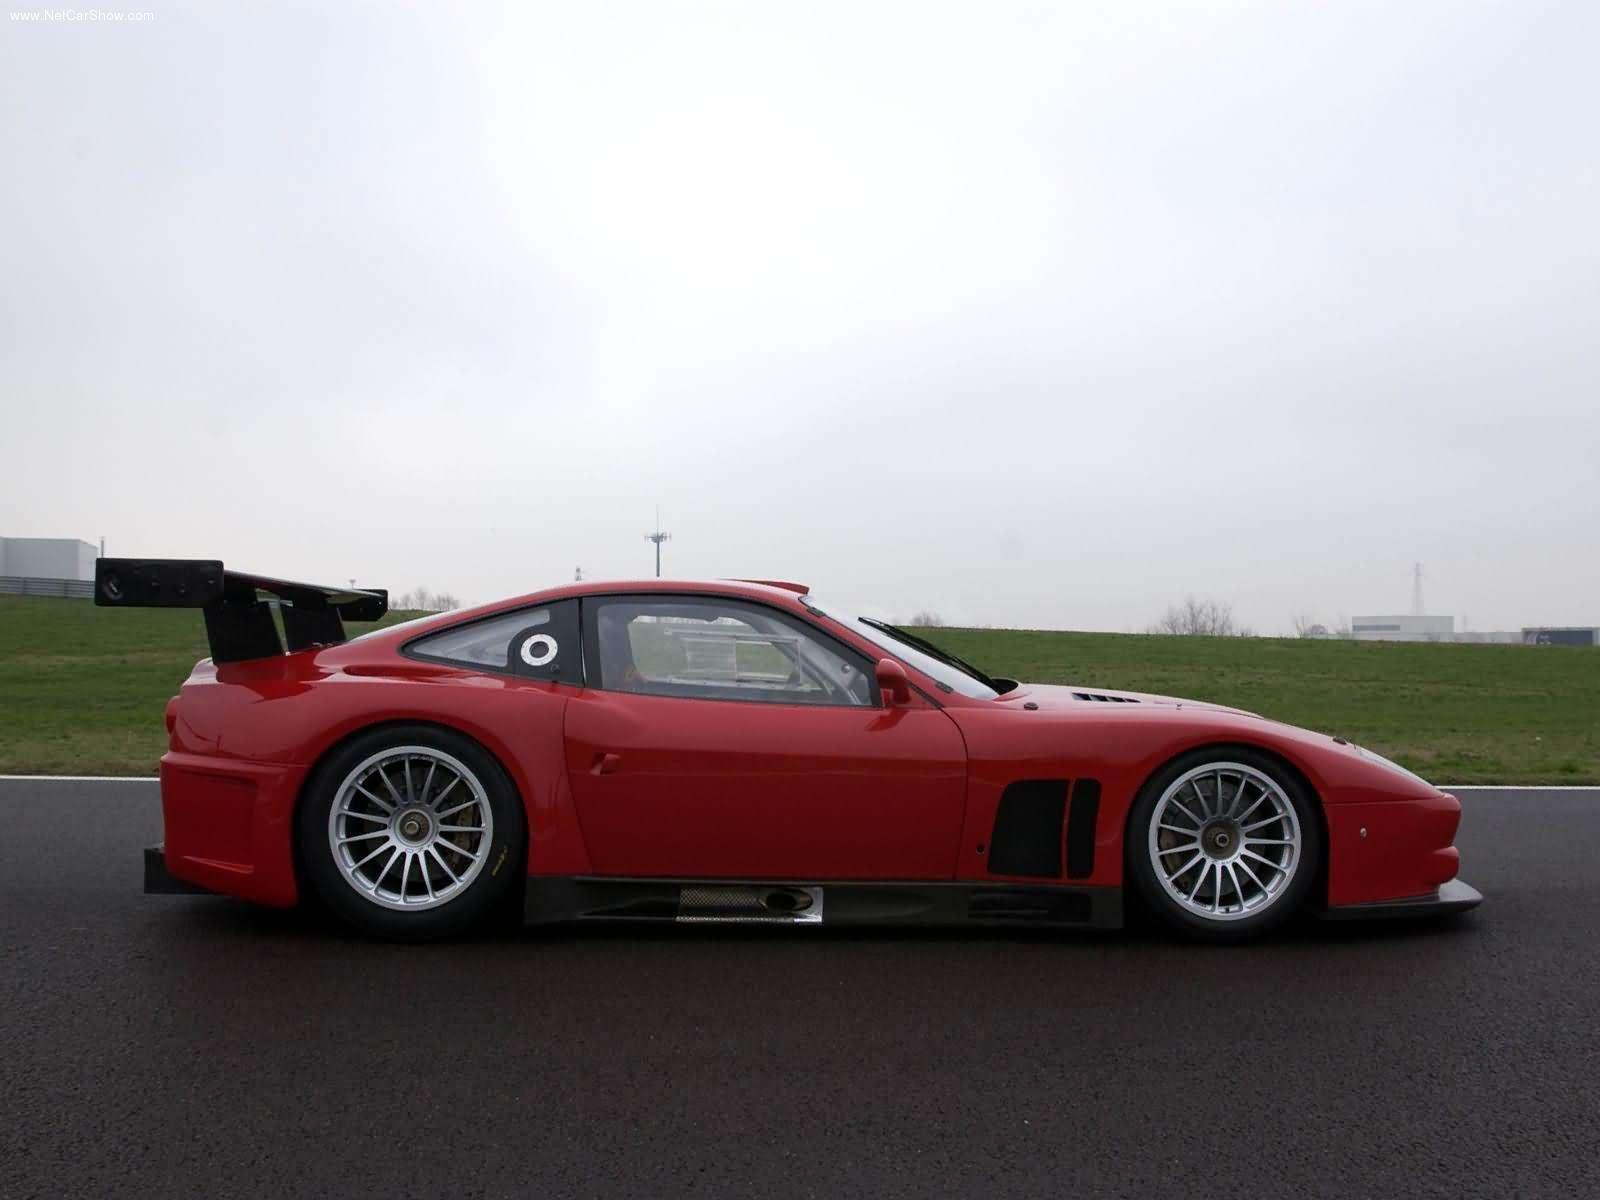 Saturday, February 4, 2012 Labels: Ferrari Wallpapers